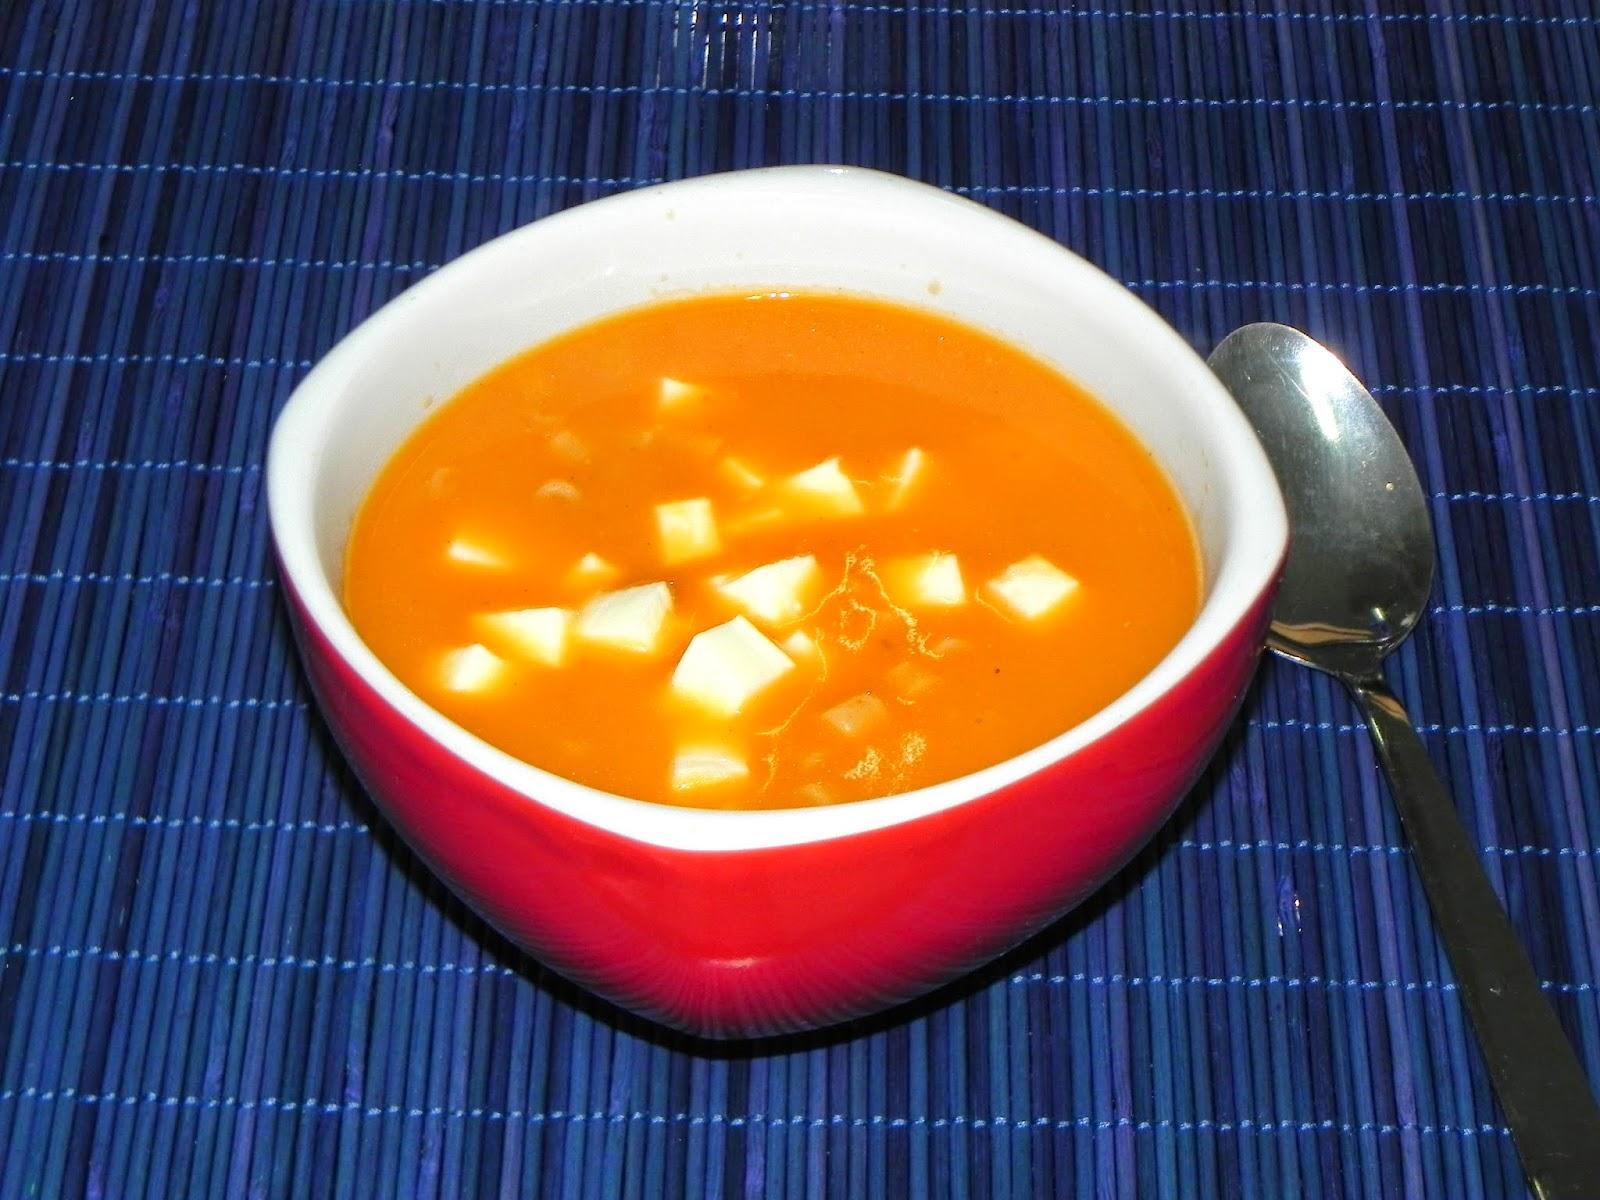 sopa receita fácil